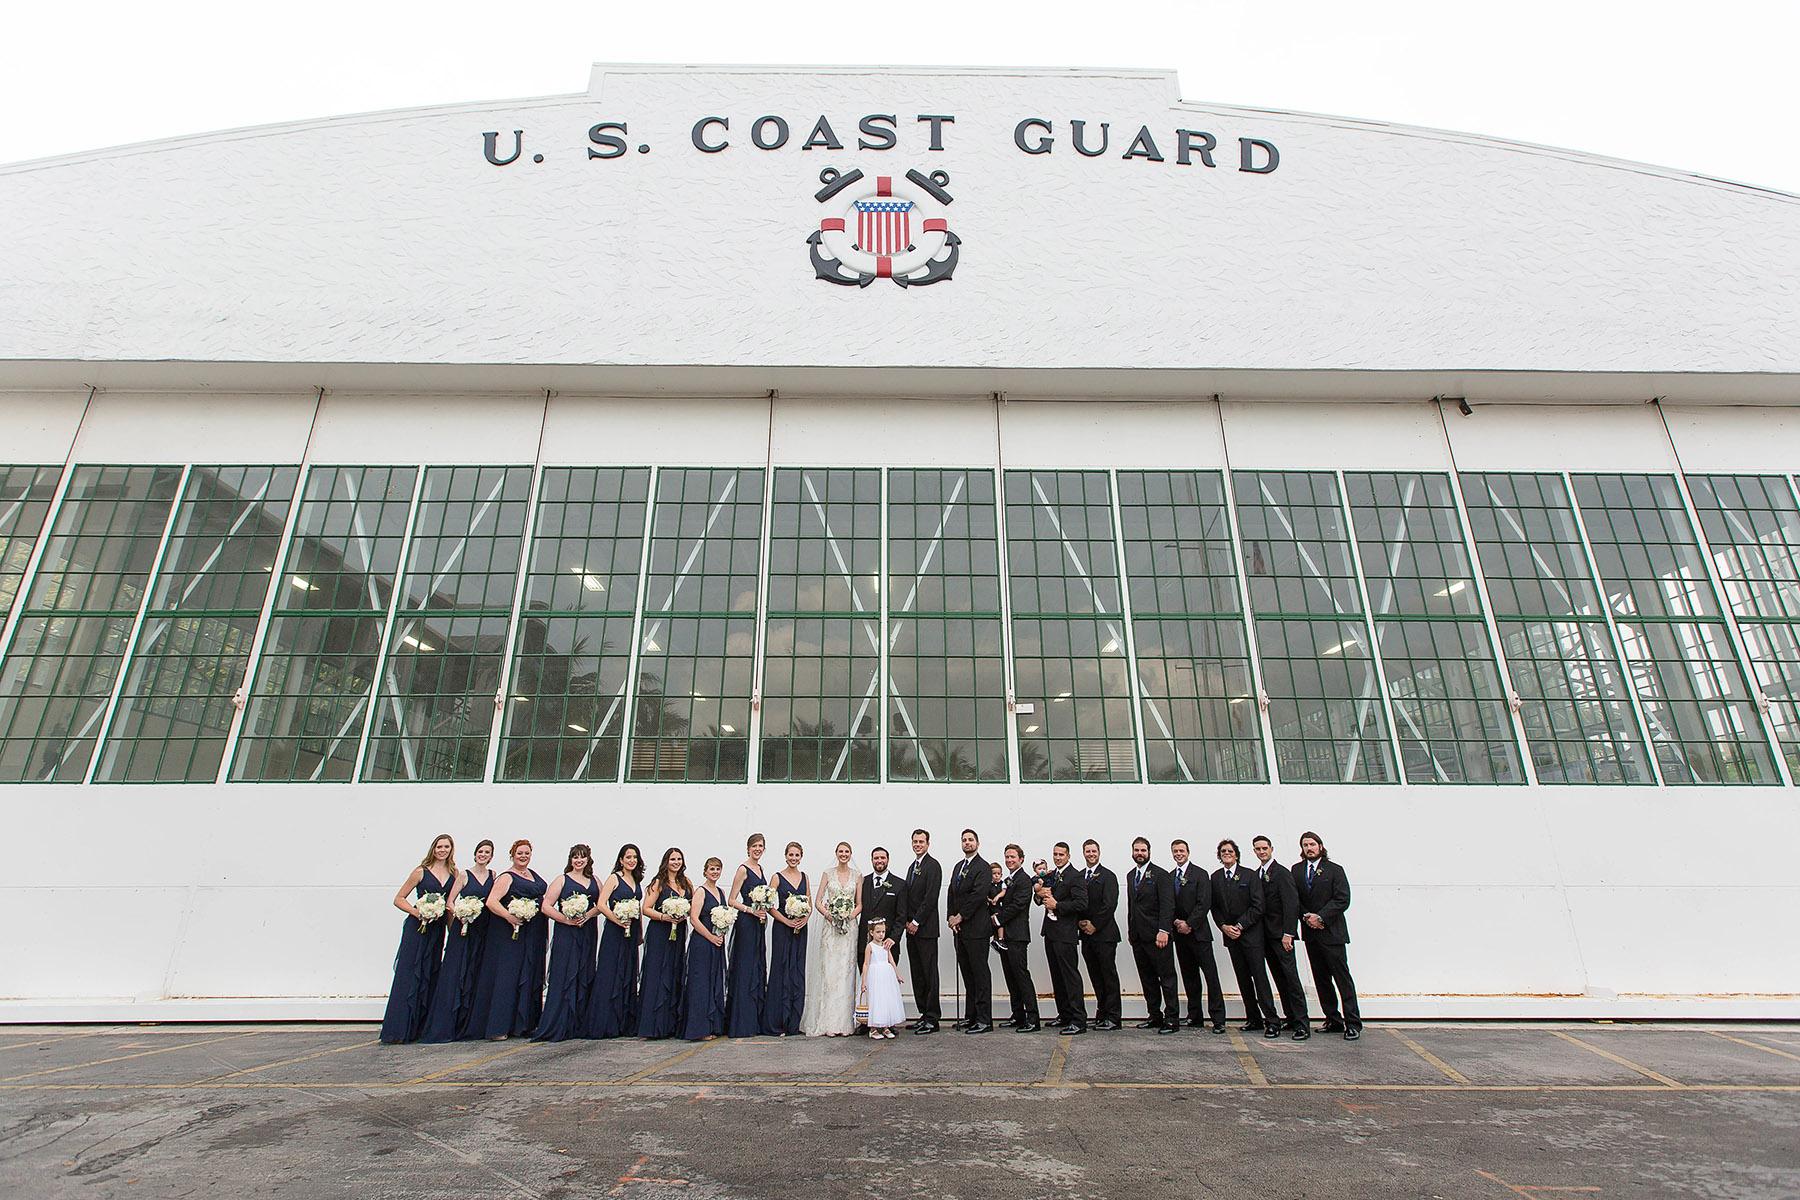 wedding party at coast guard hanger tiny house photo florida weddings